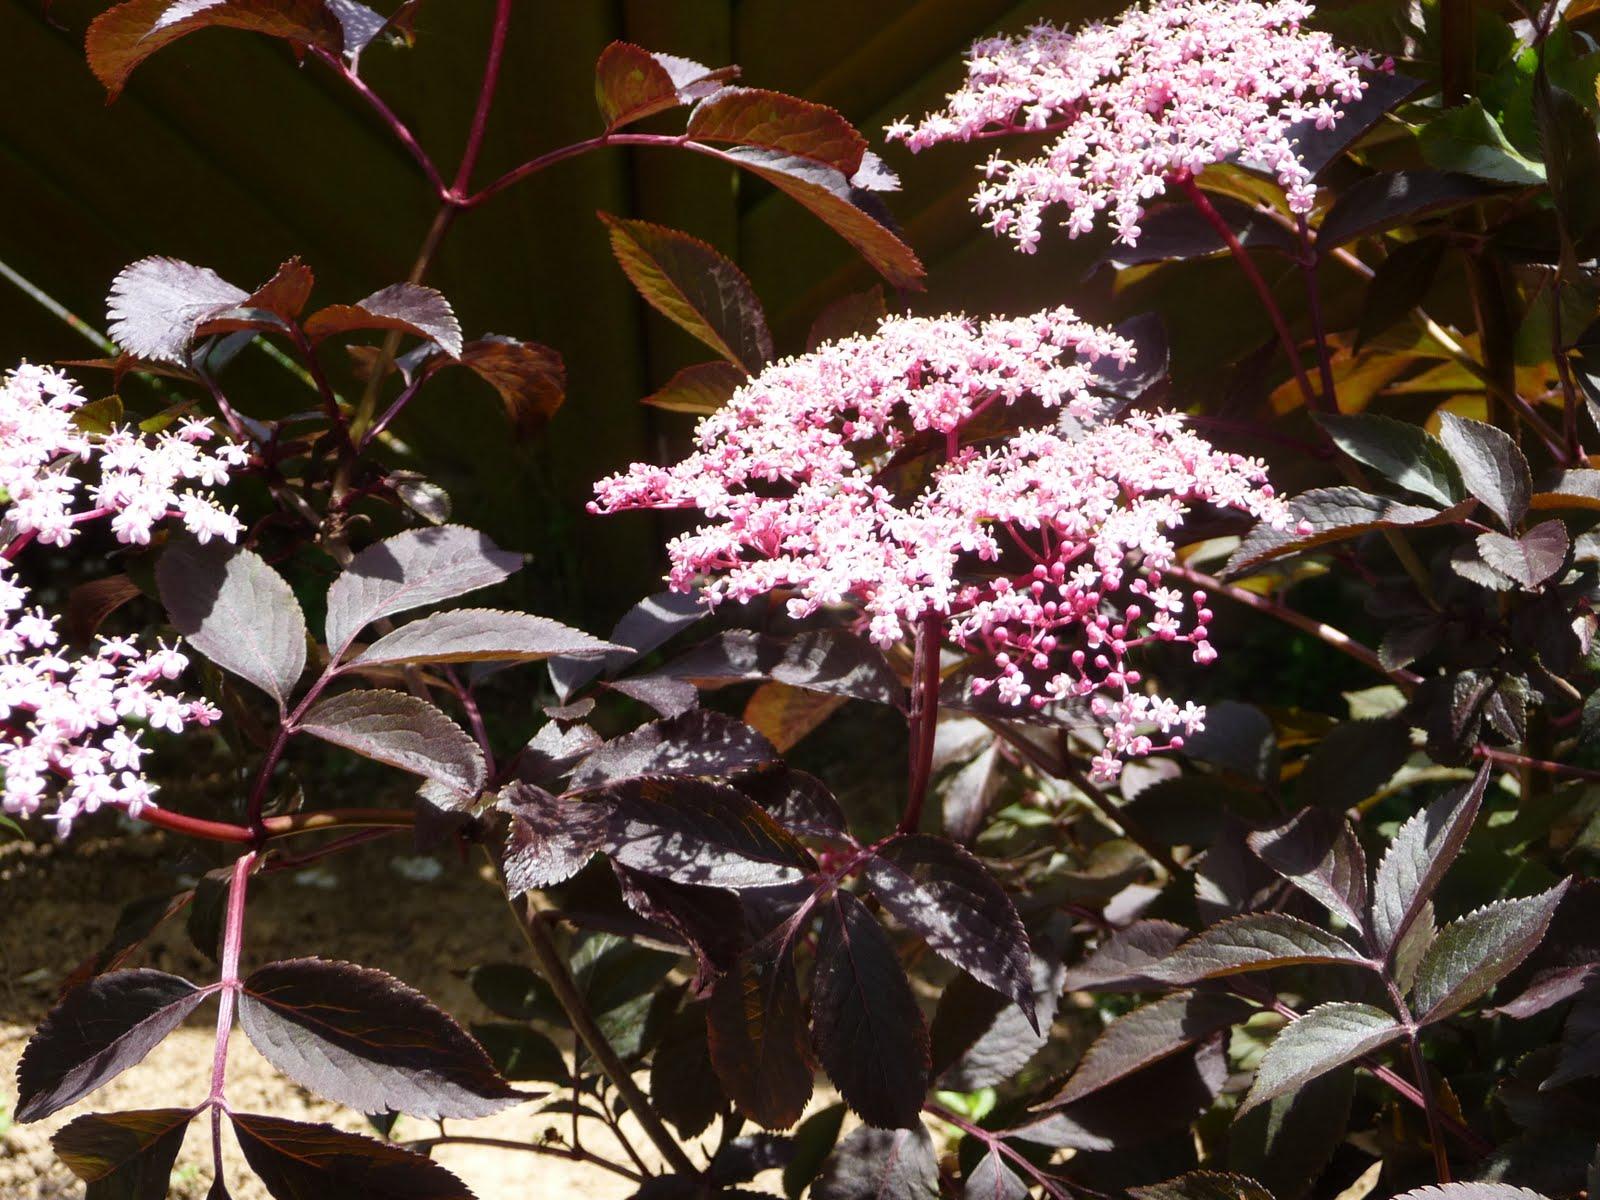 Arbuste Nain Persistant Plein Soleil ma terre de bruyère: pourpre, purpurea ou purple .